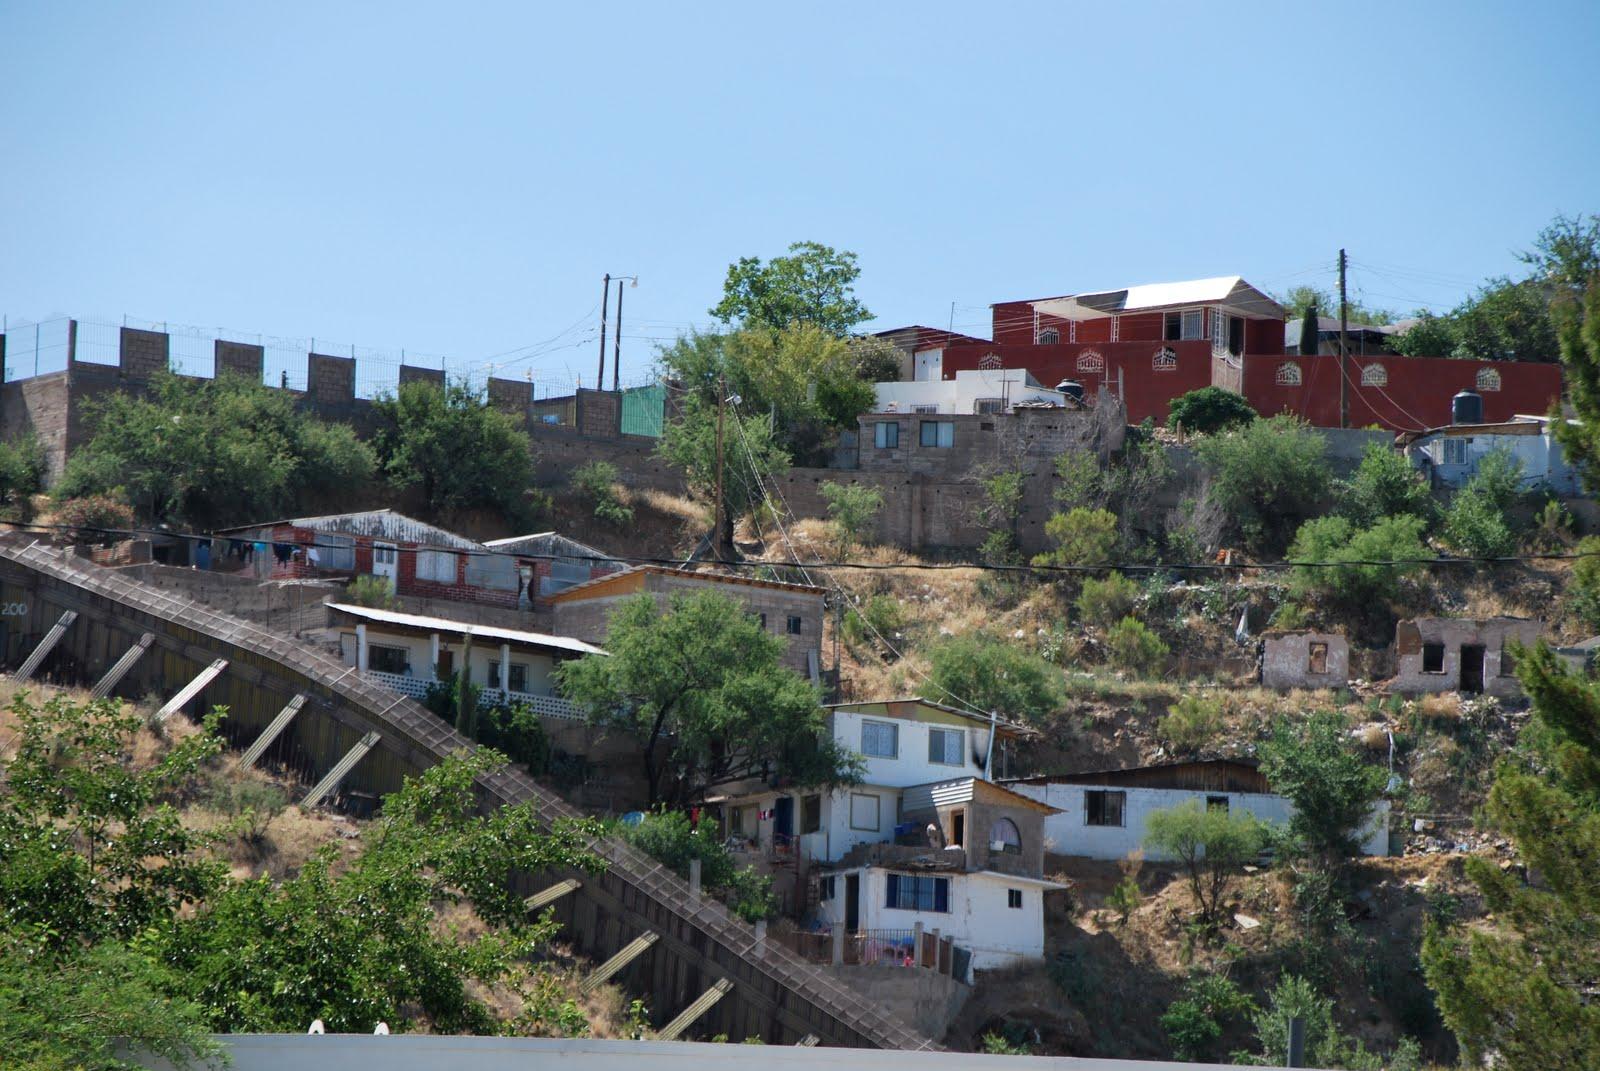 Tom mclaughlin tense at the arizona border in nogales